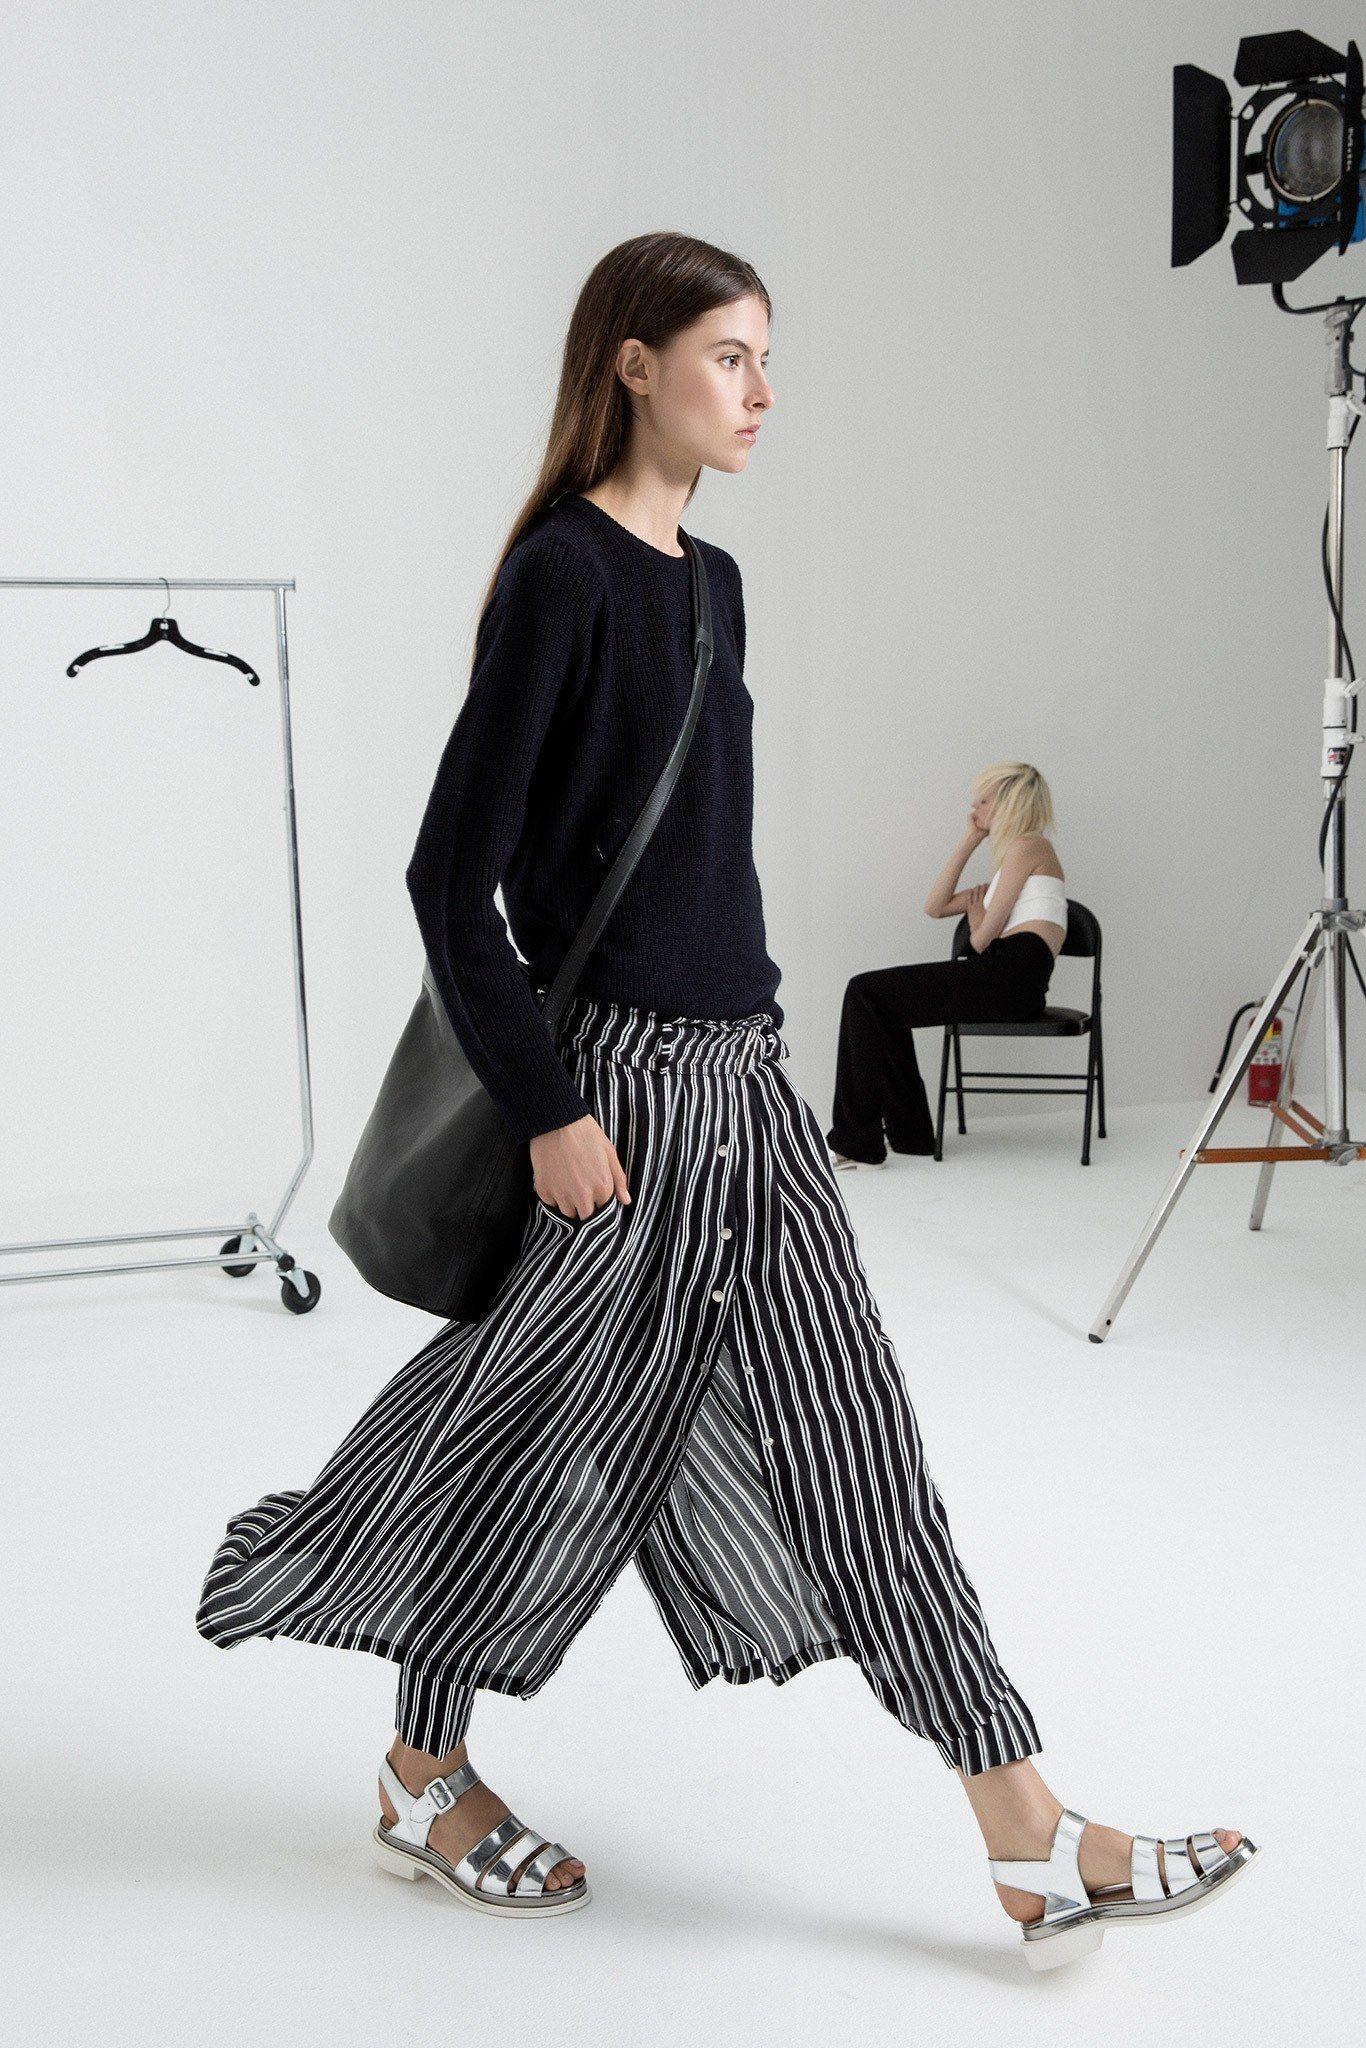 Carroll Tee | Alc clothing, Tees, Tshirt style